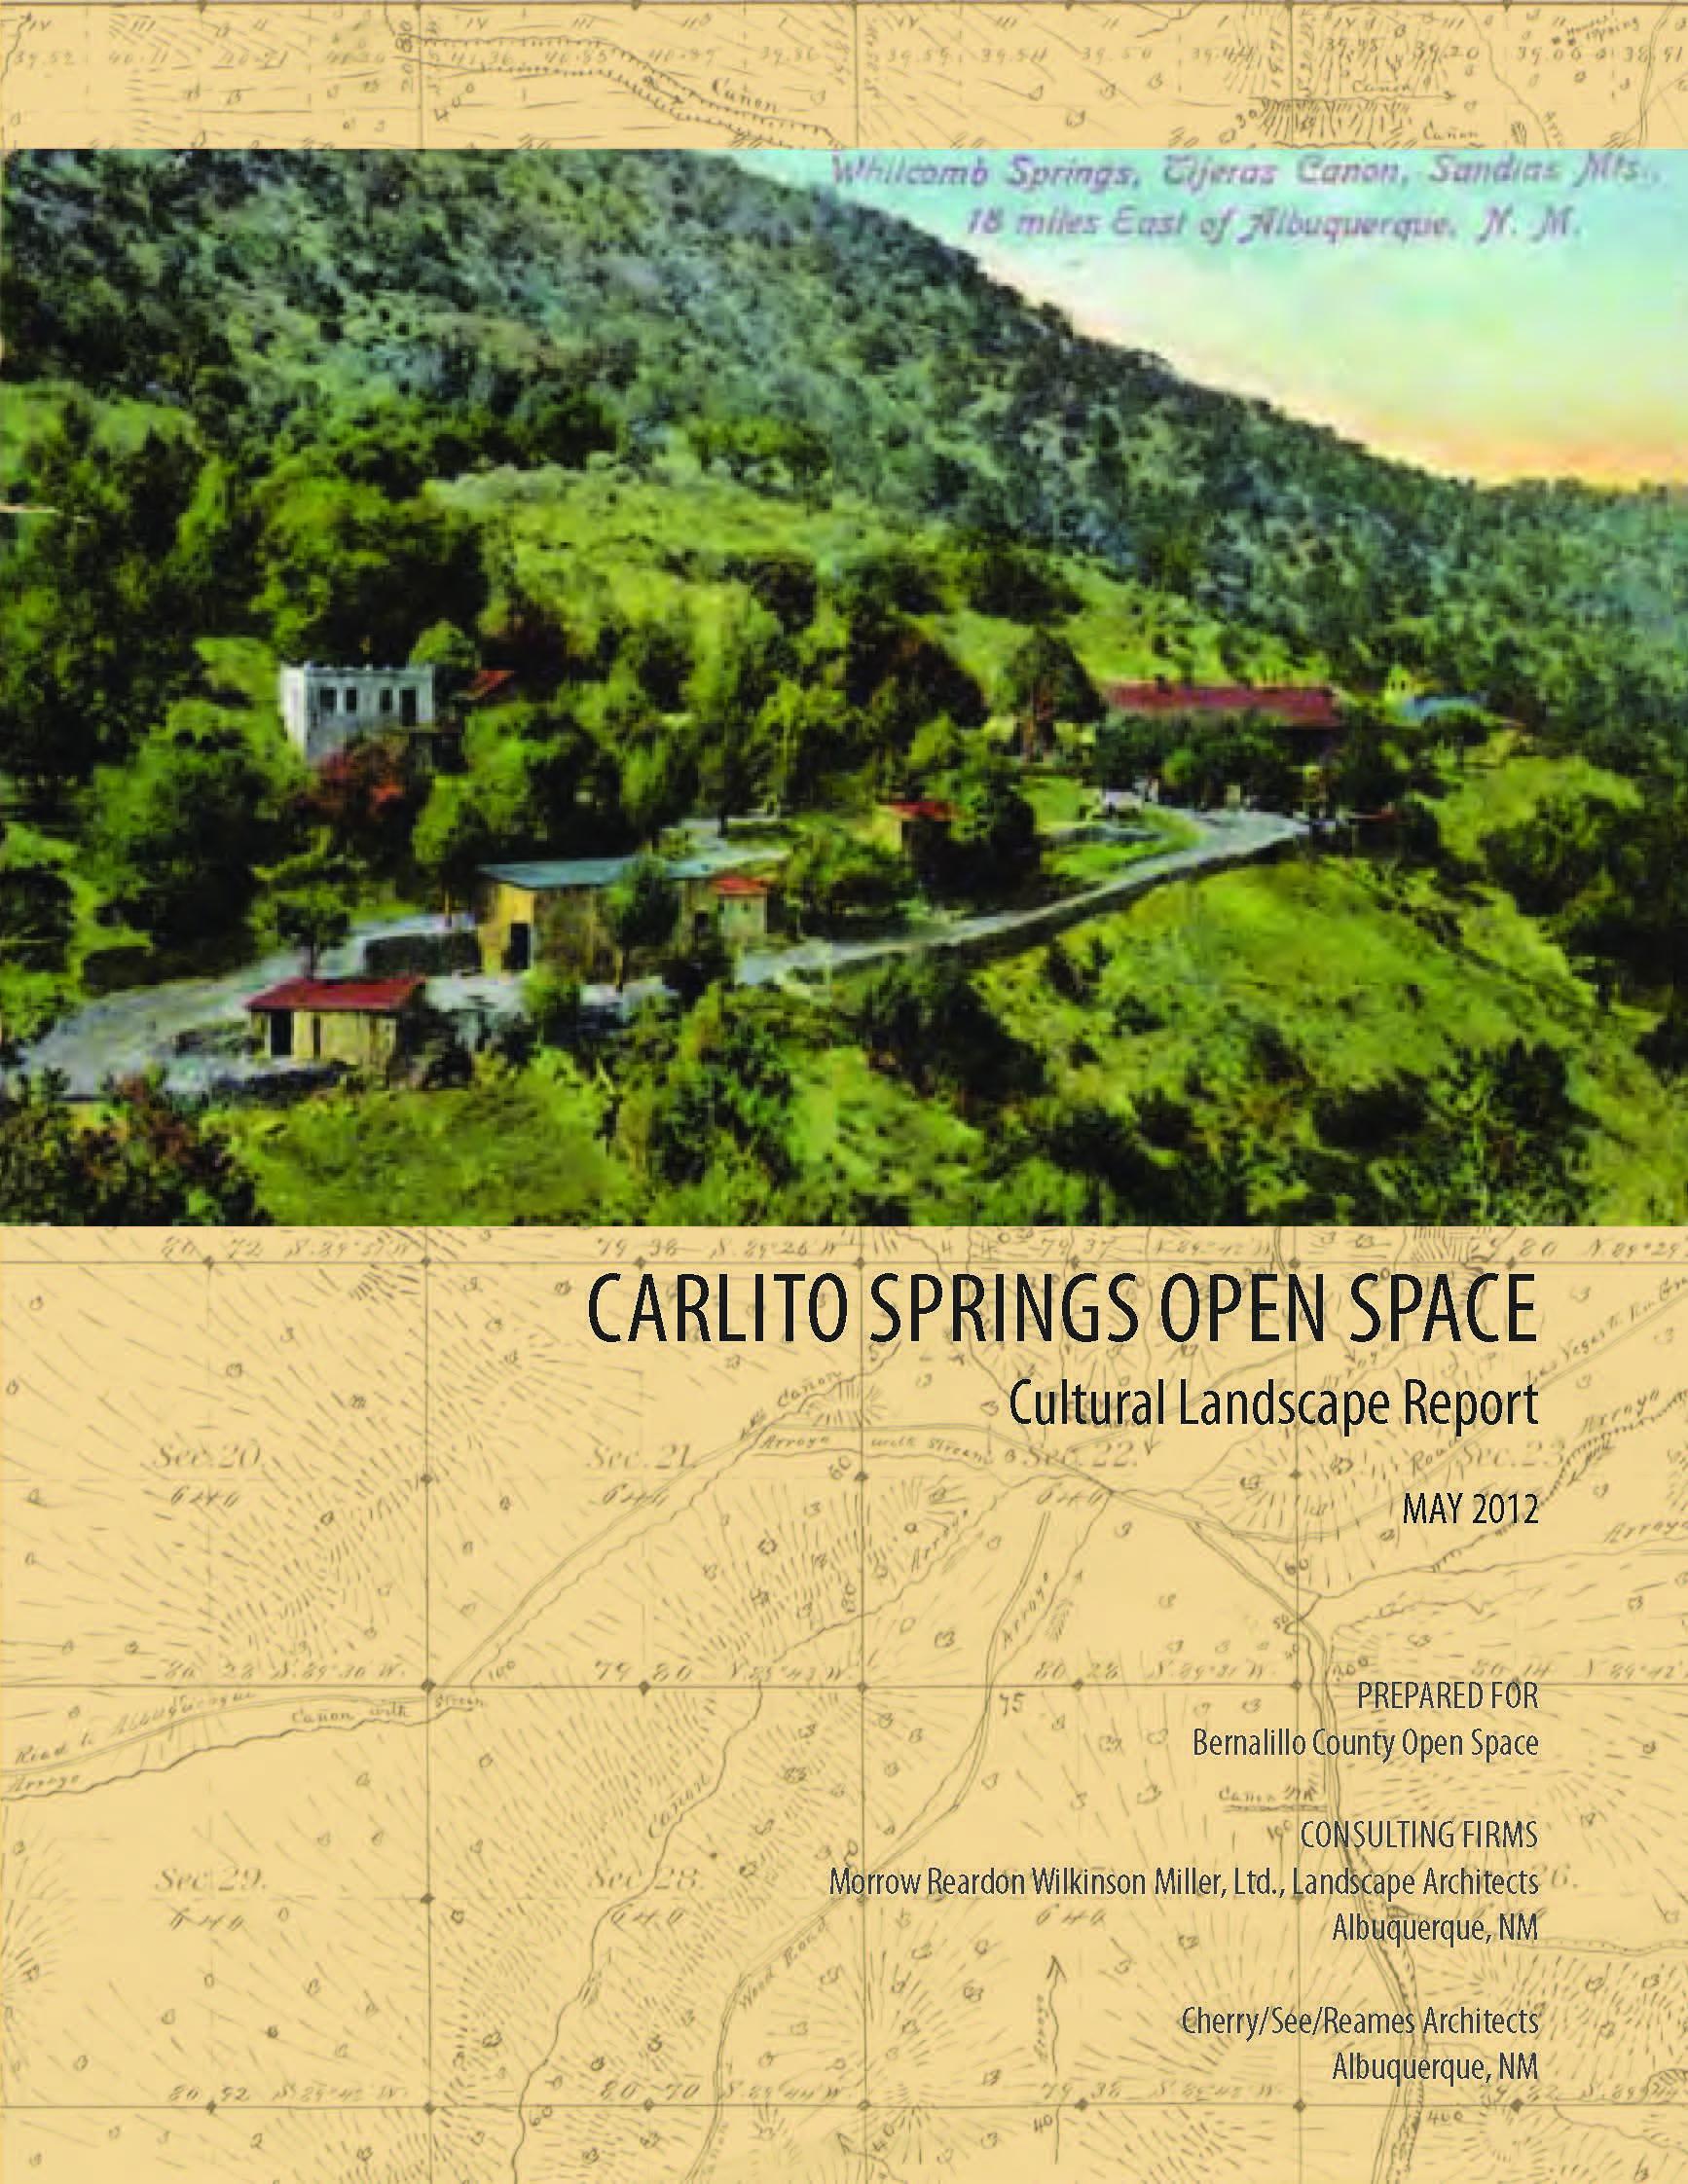 Carlito Springs Open Space - Cultural Landscape Report